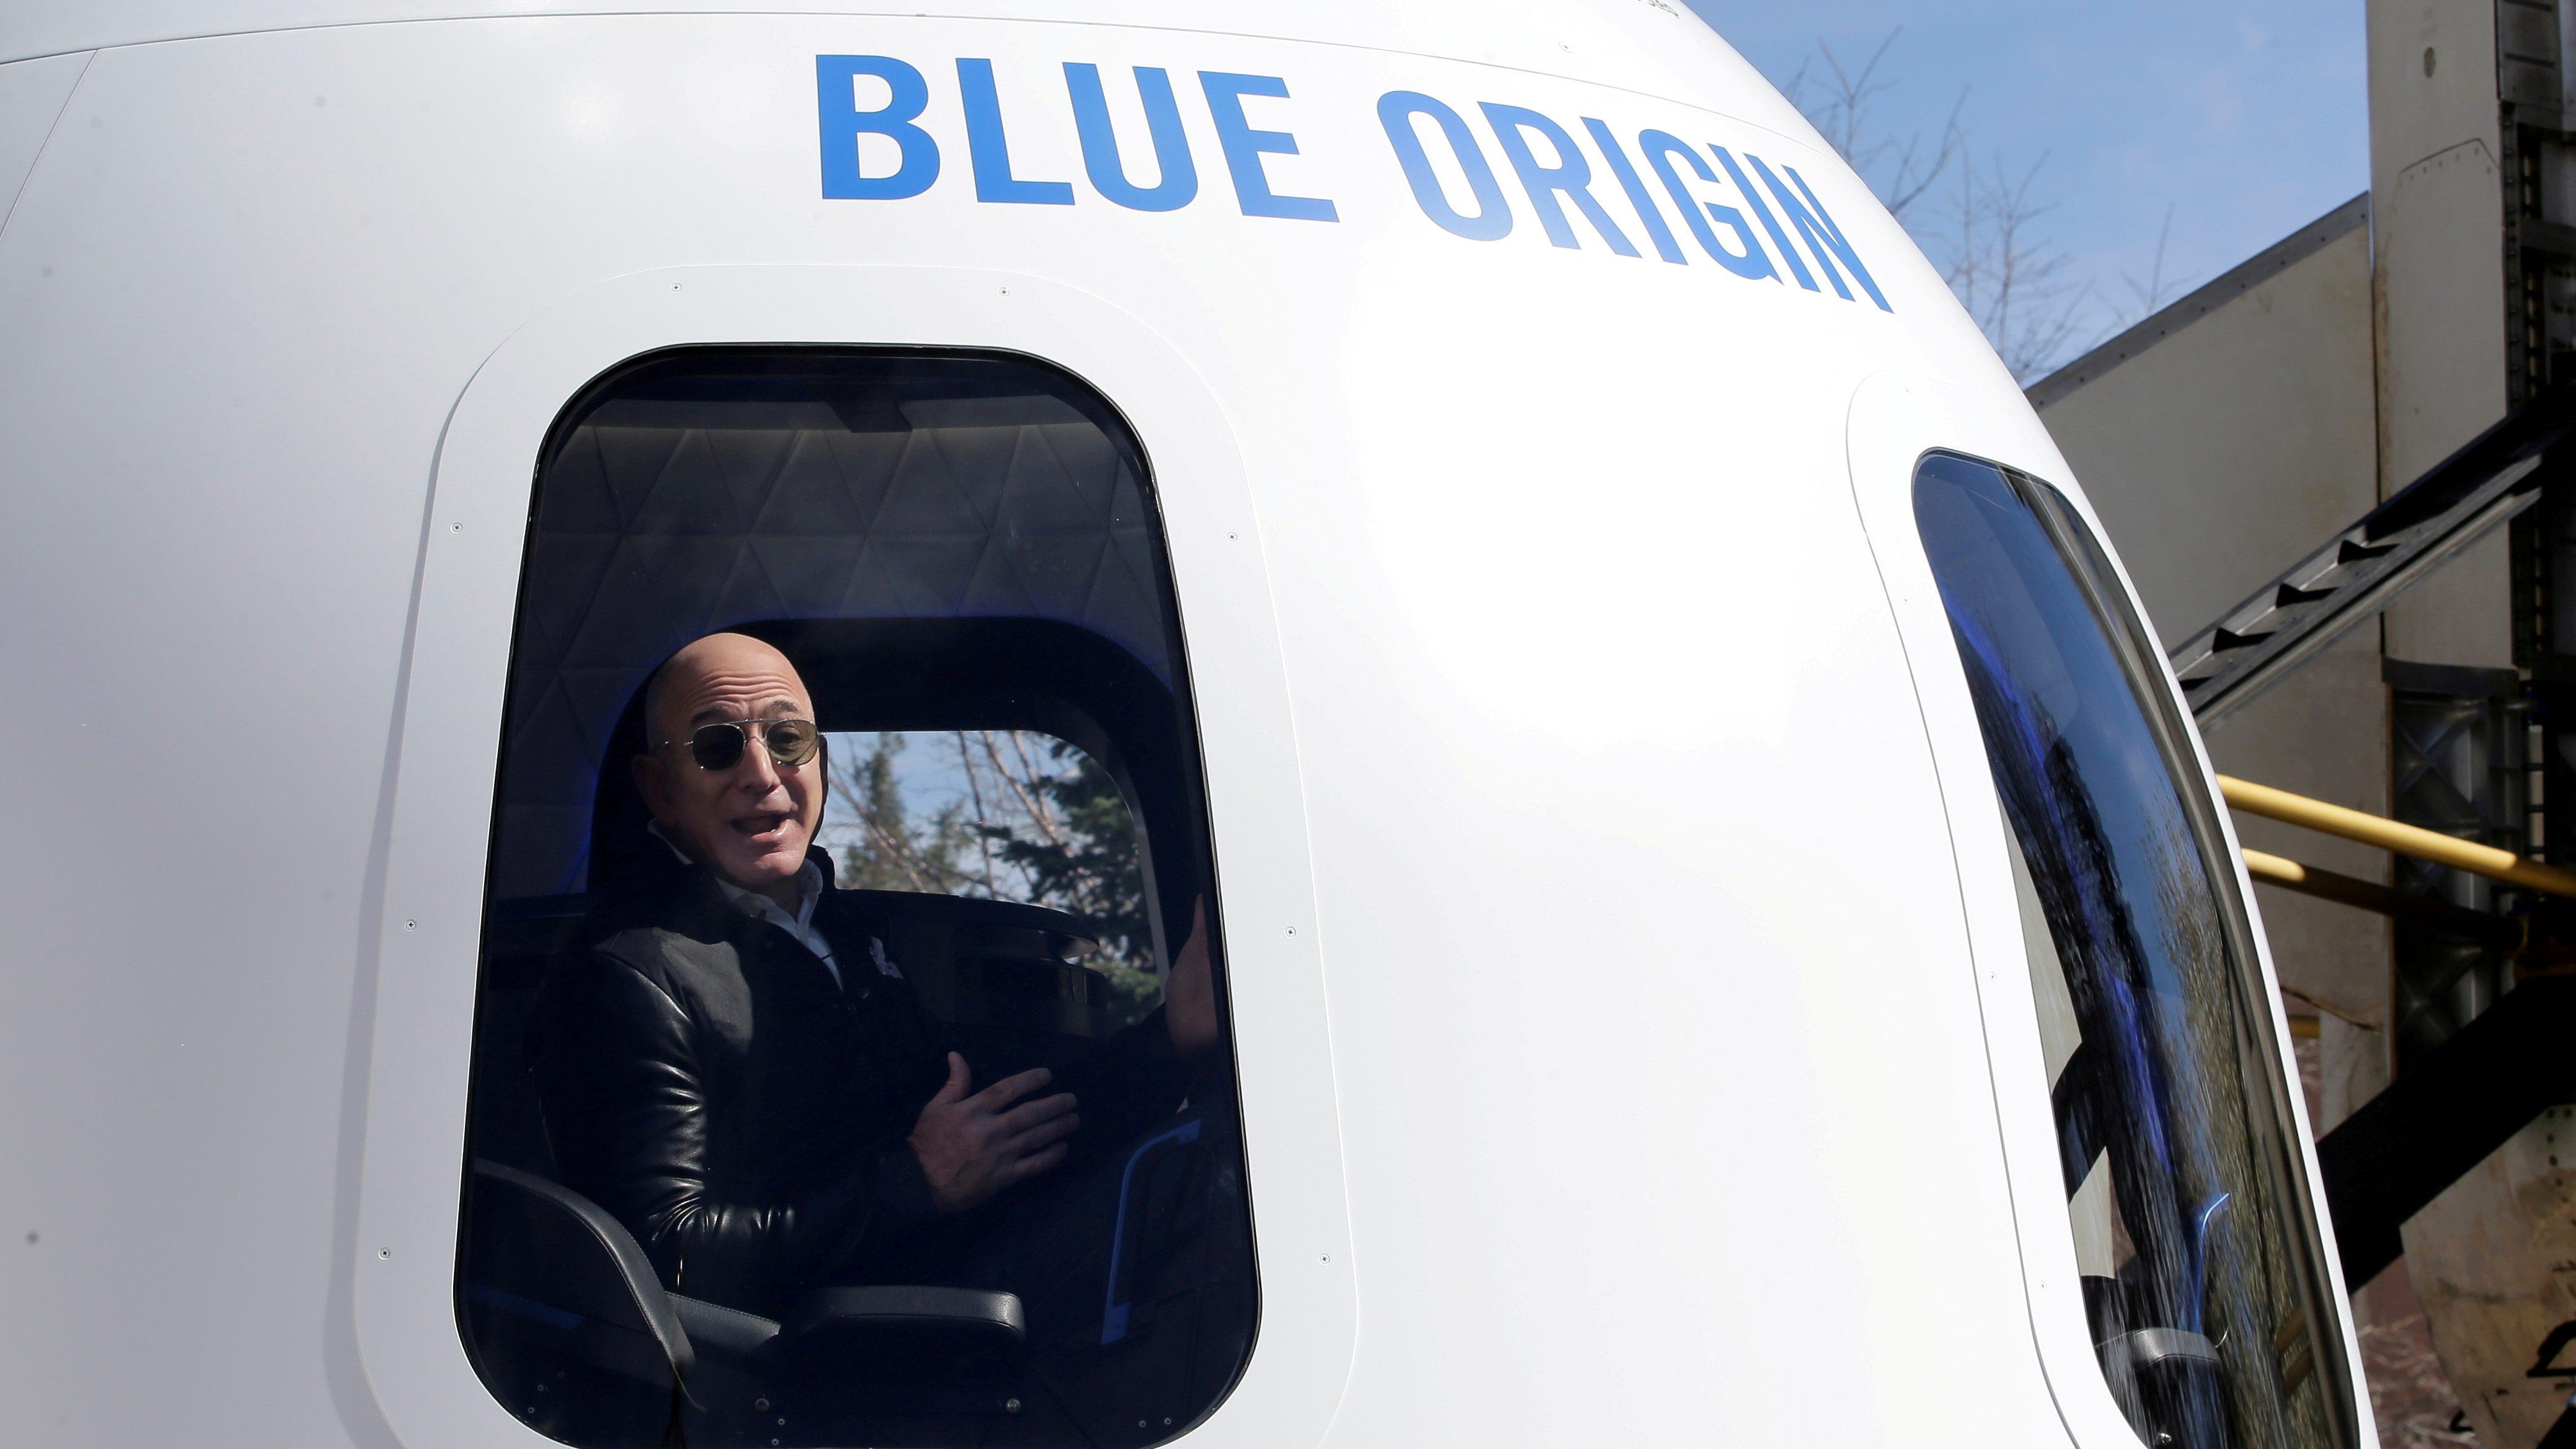 Jeff Bezos is seen inside a Blue Origin spacecraft